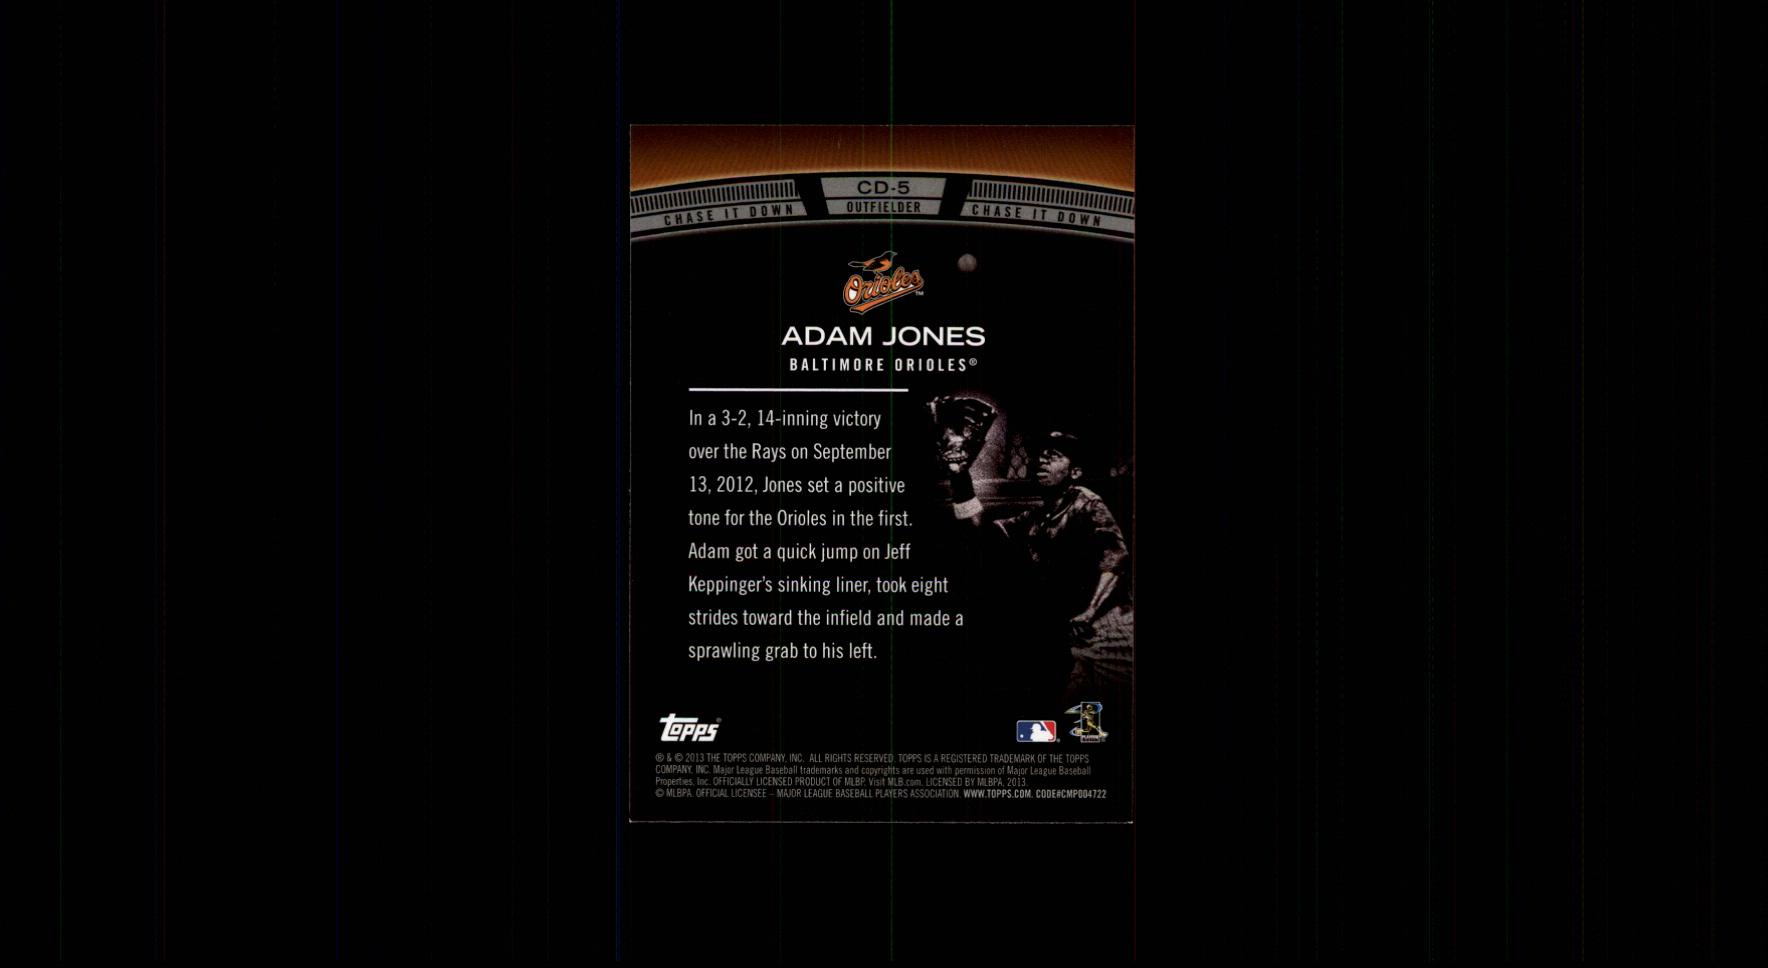 2013 Topps Chase It Down #CD5 Adam Jones back image